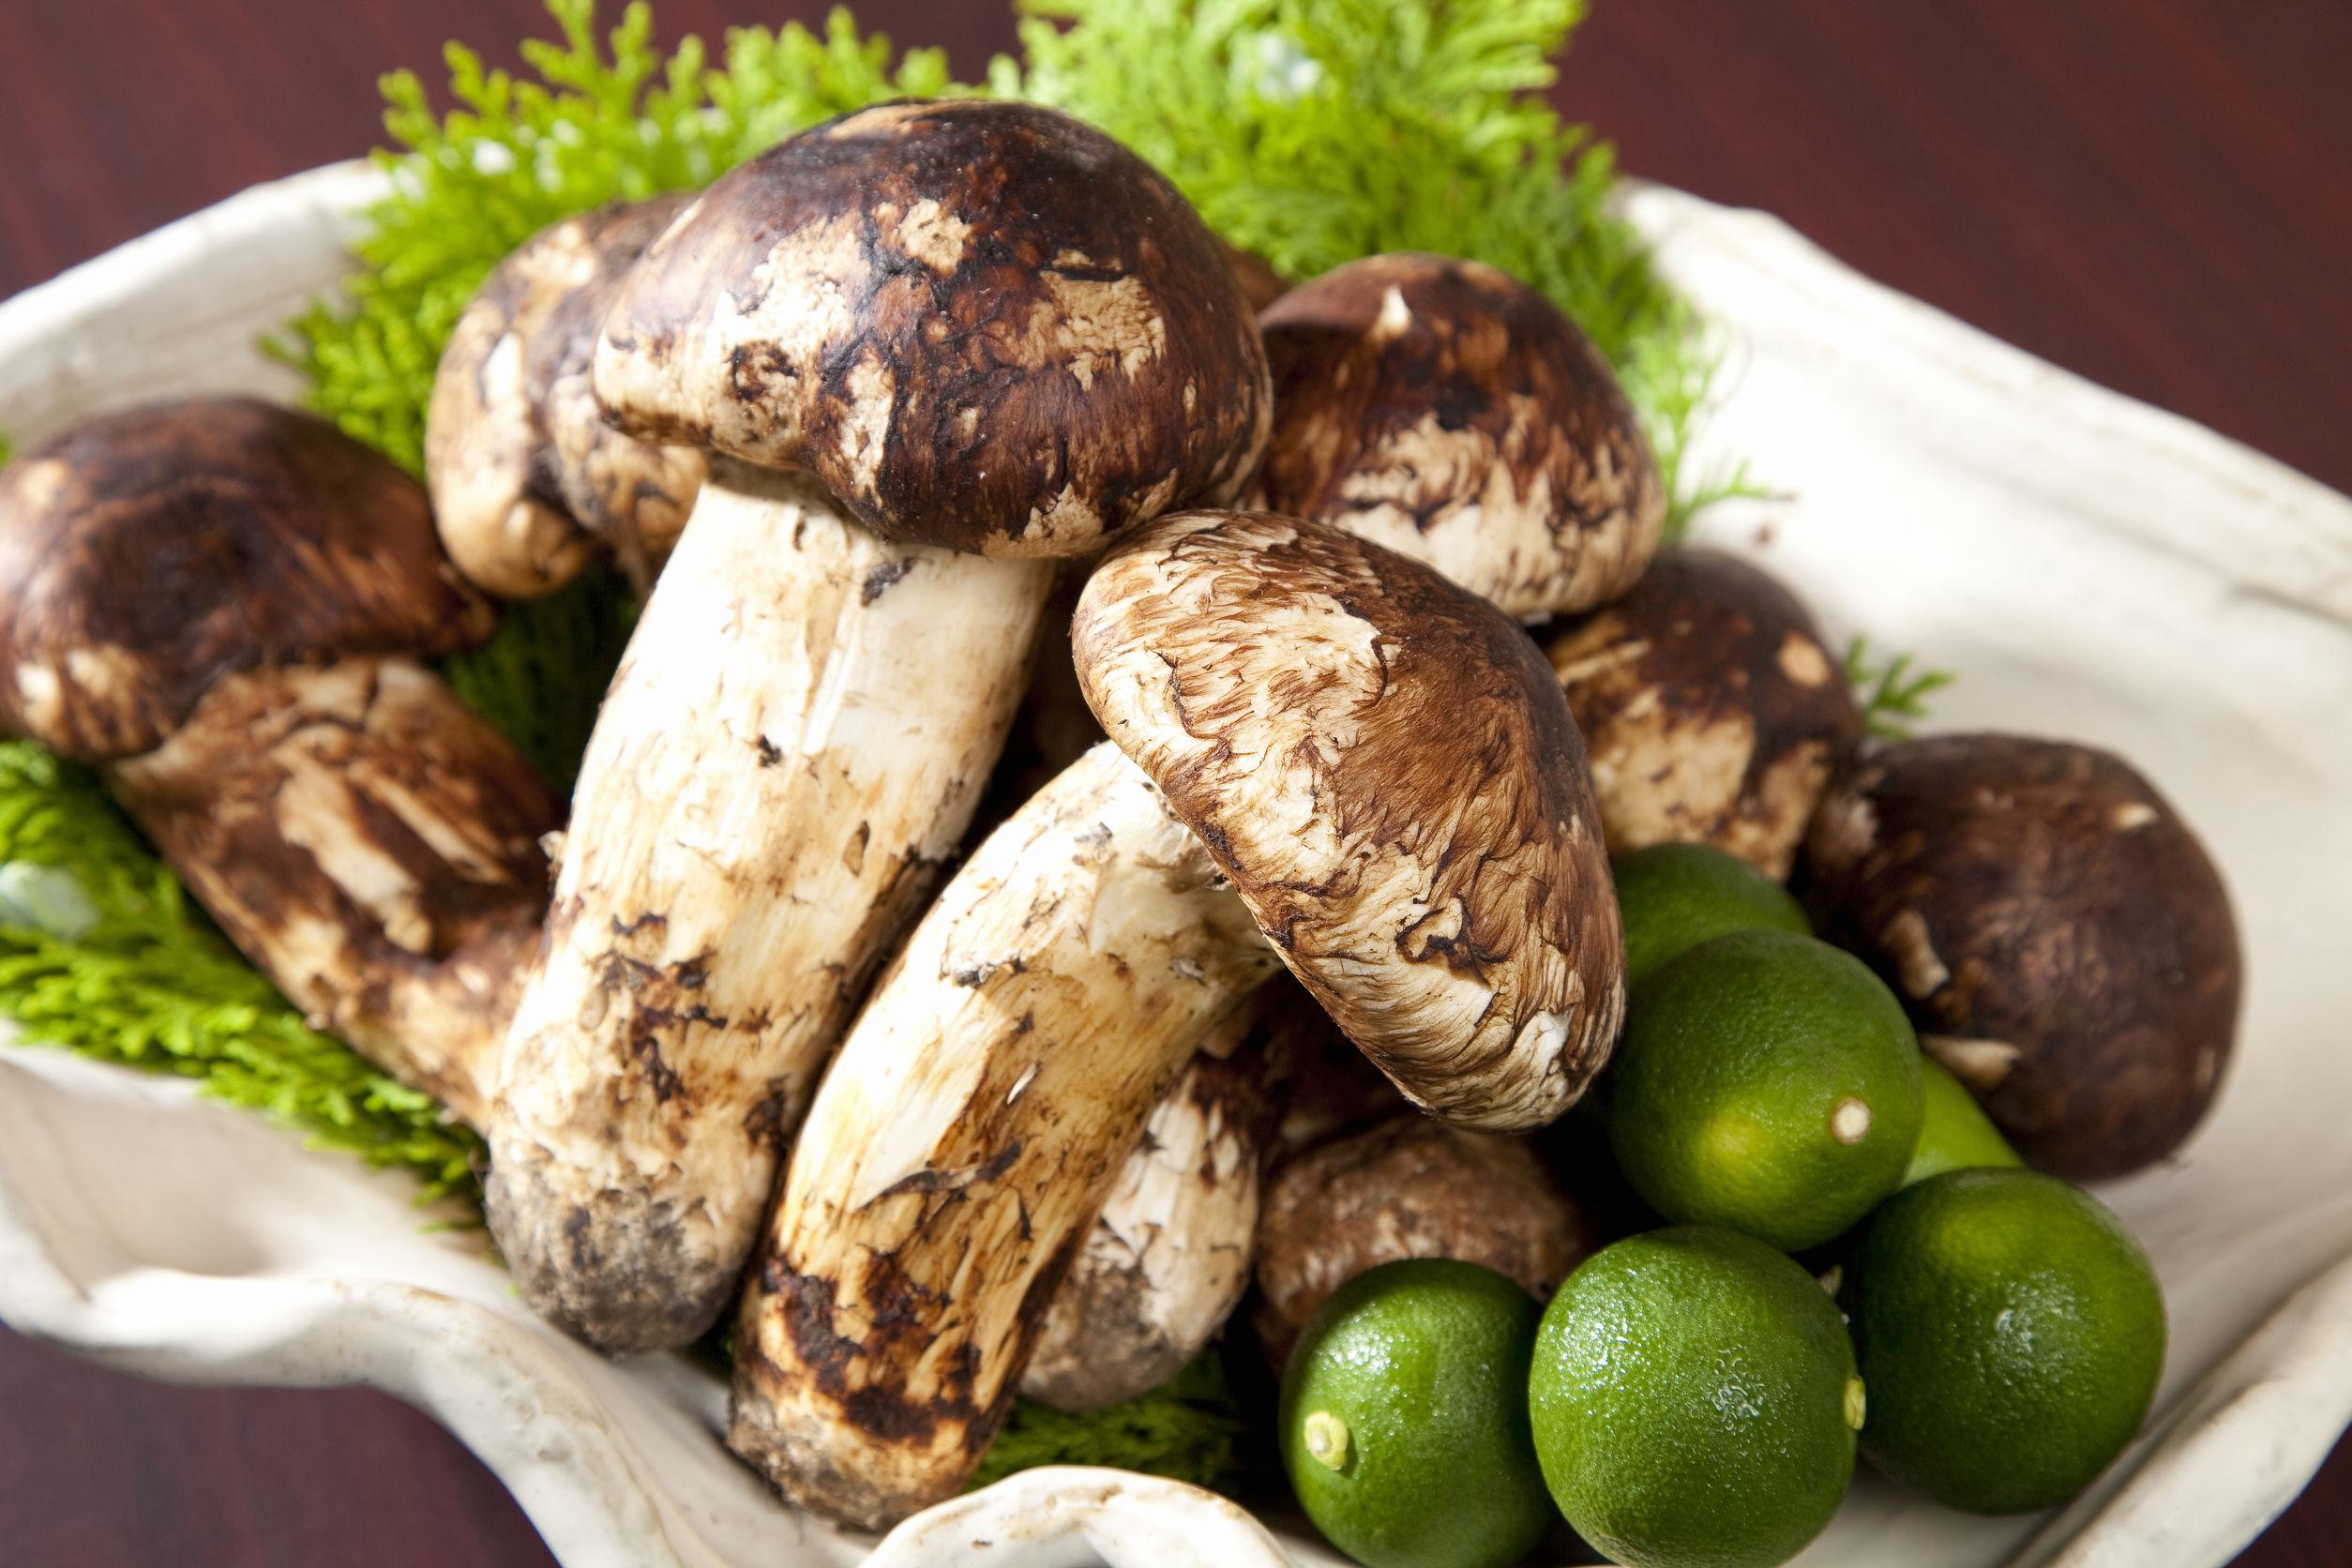 43506267 - matsutake mushroom